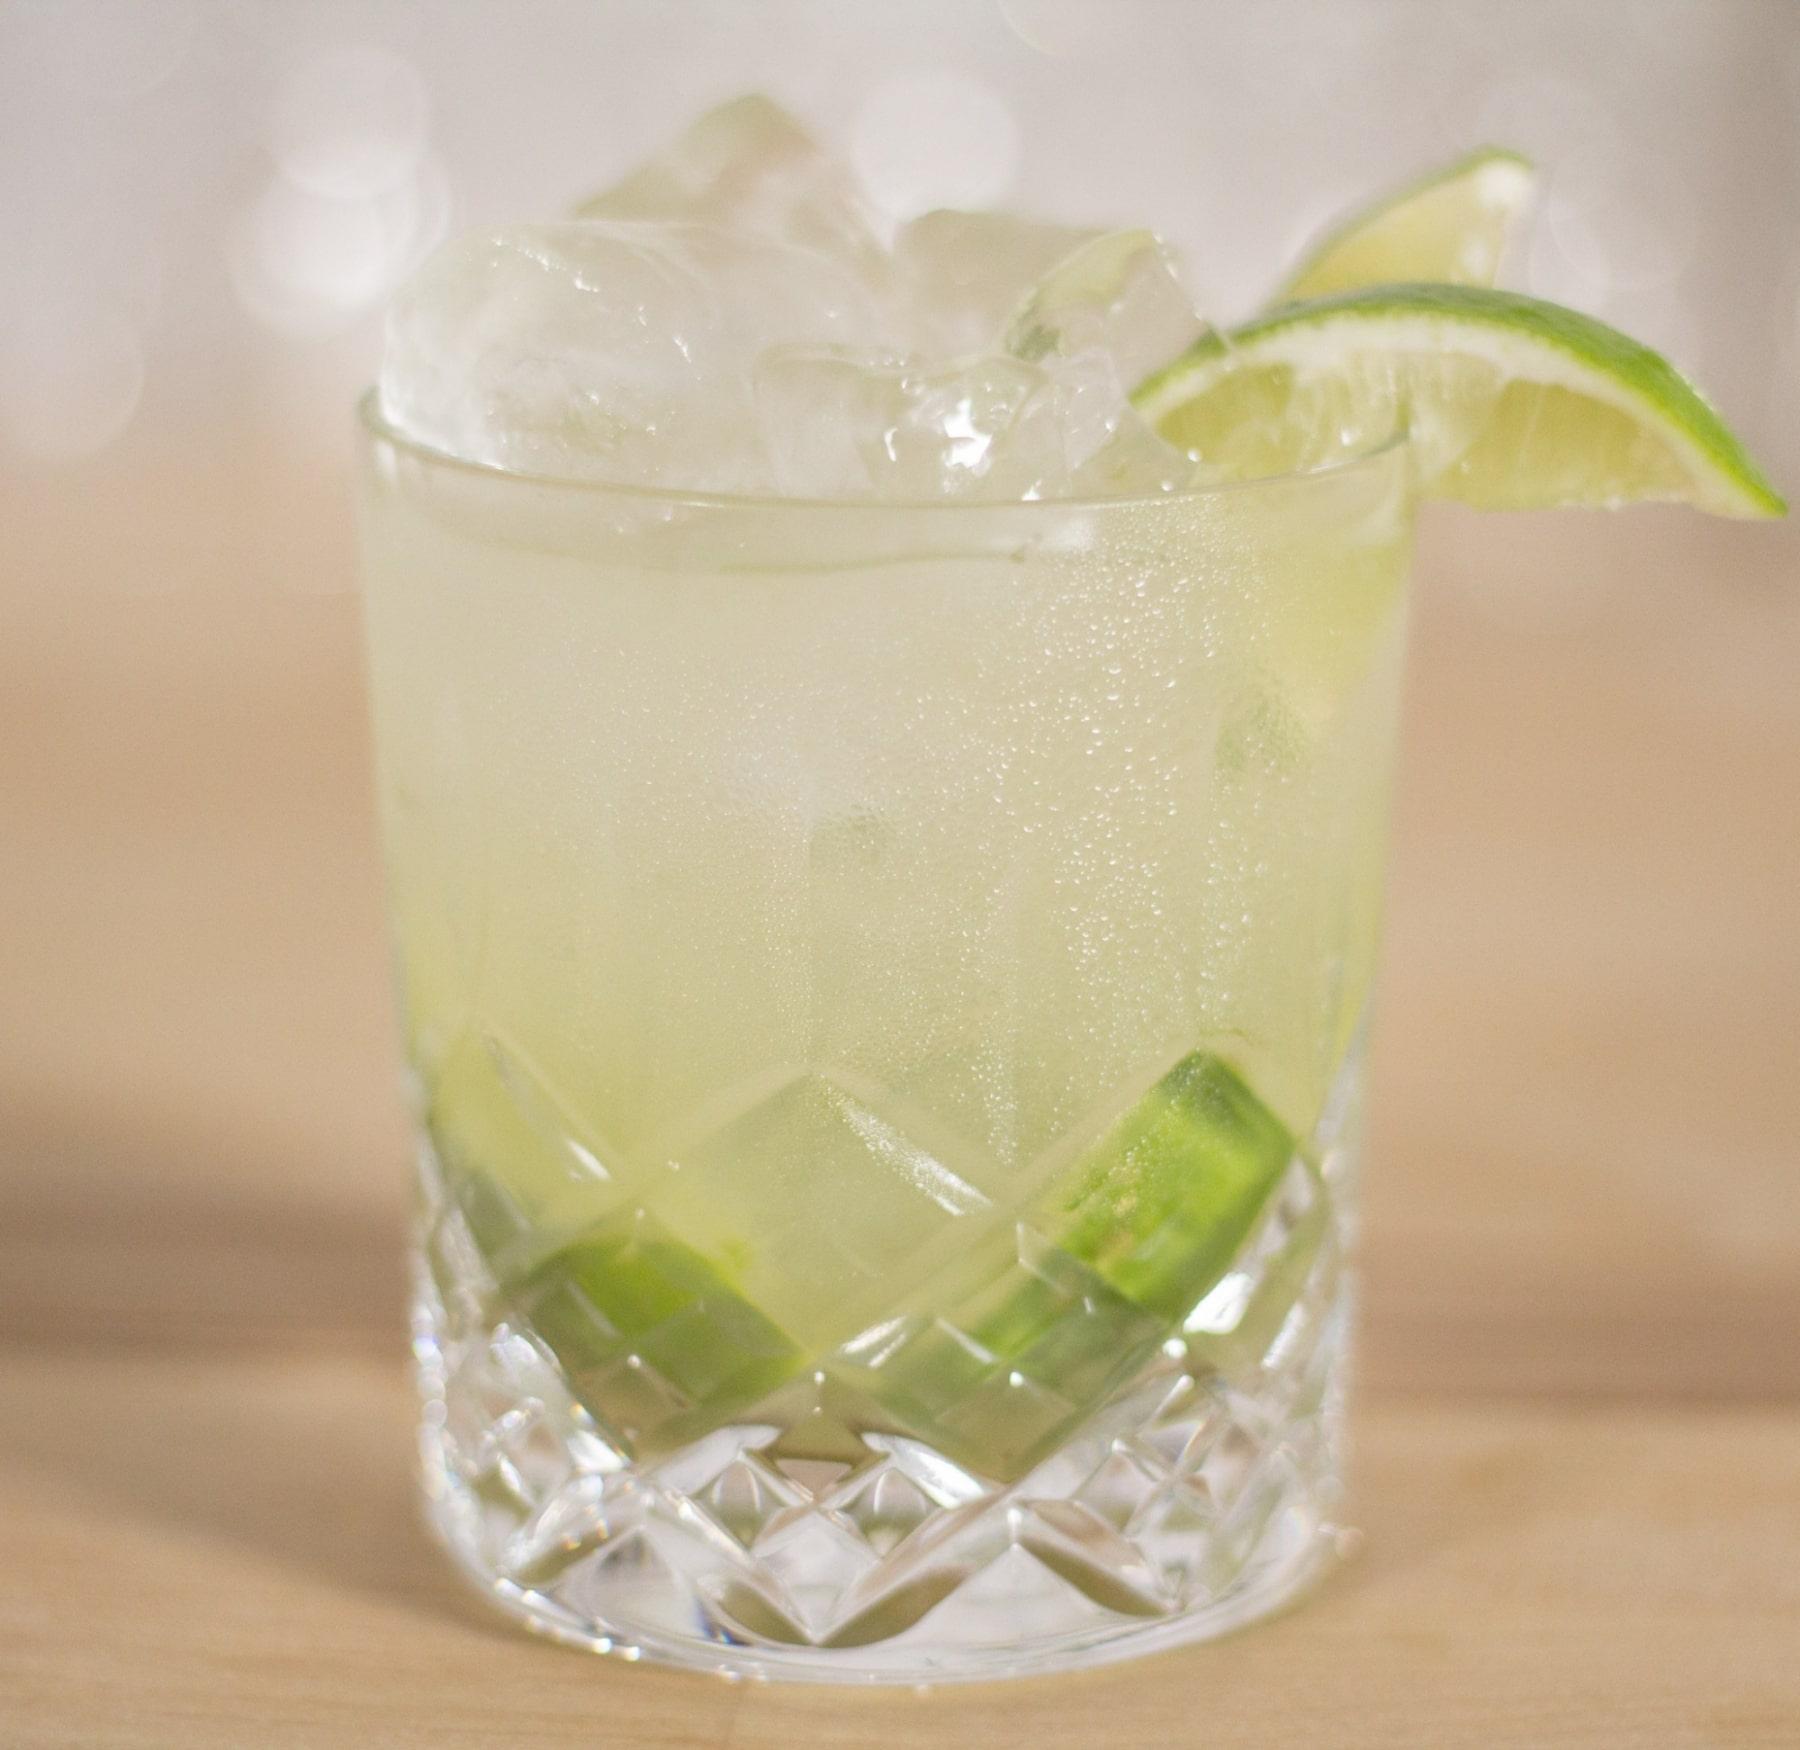 caipiroska poured in glass with lemon